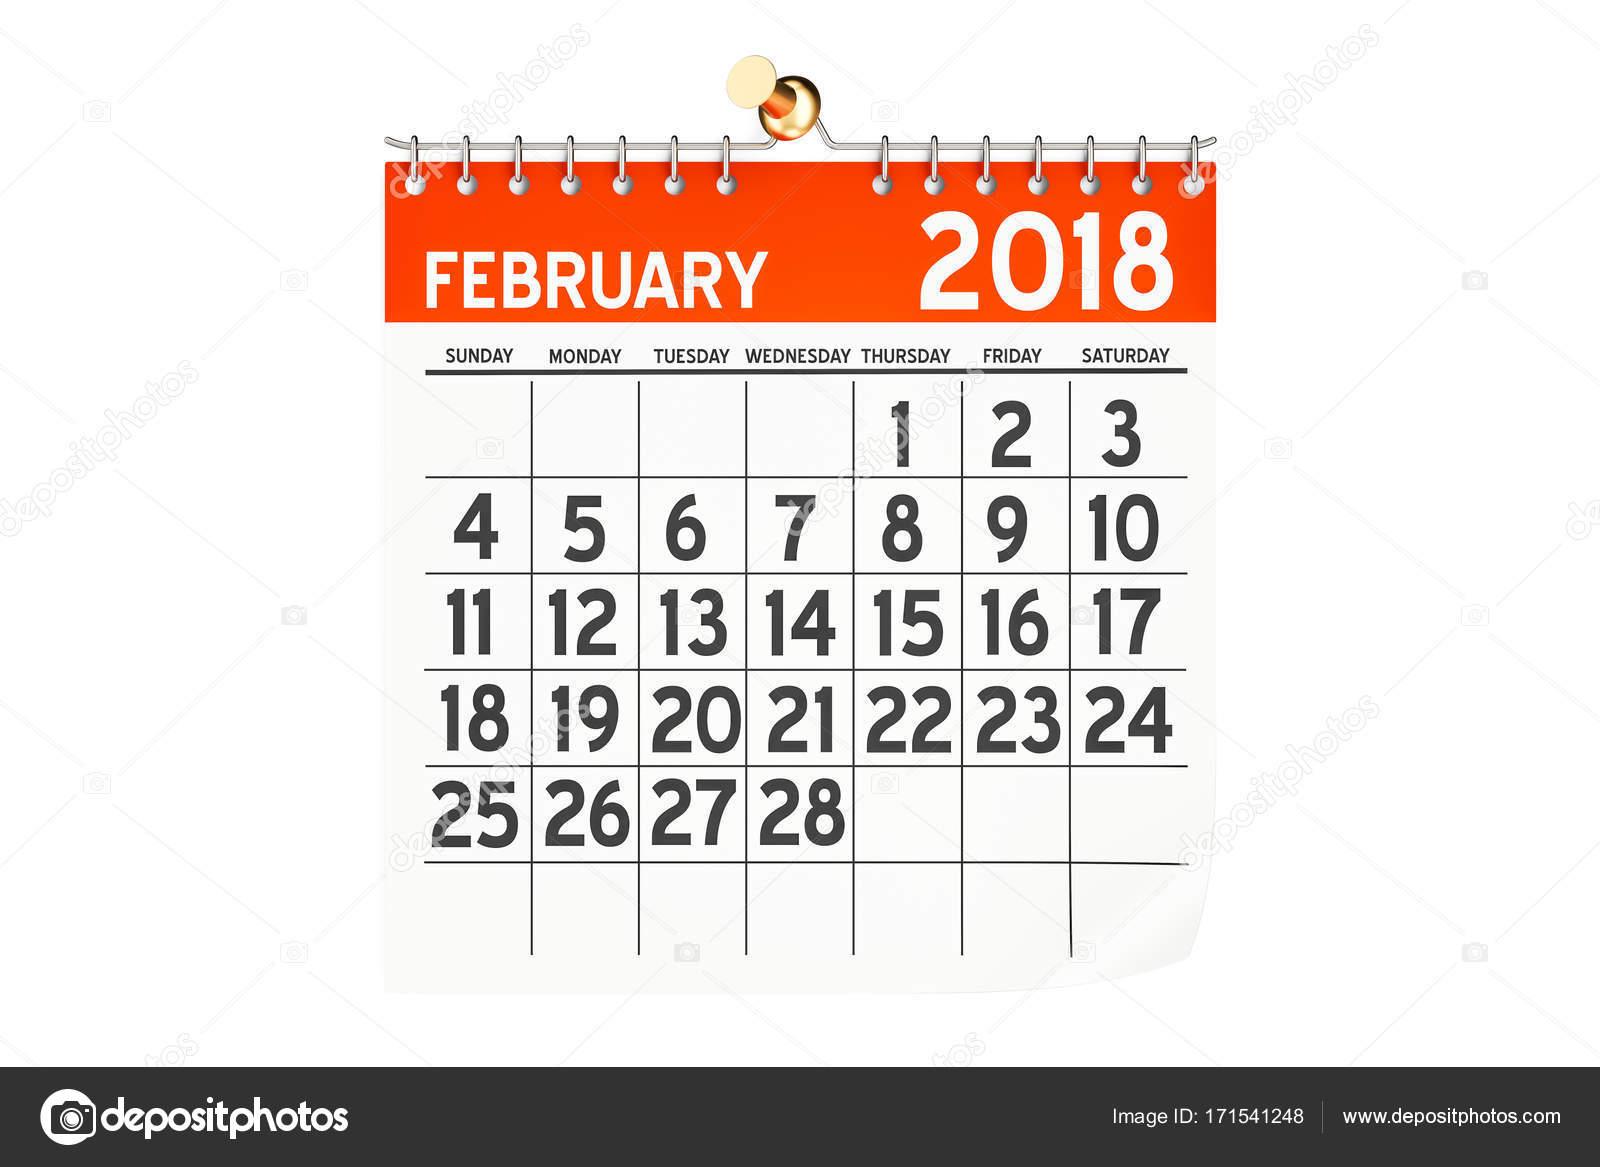 55404eea823ff Calendario En Blanco Febrero 2018 Febrero 2018 - Wallpaperworld1st.com